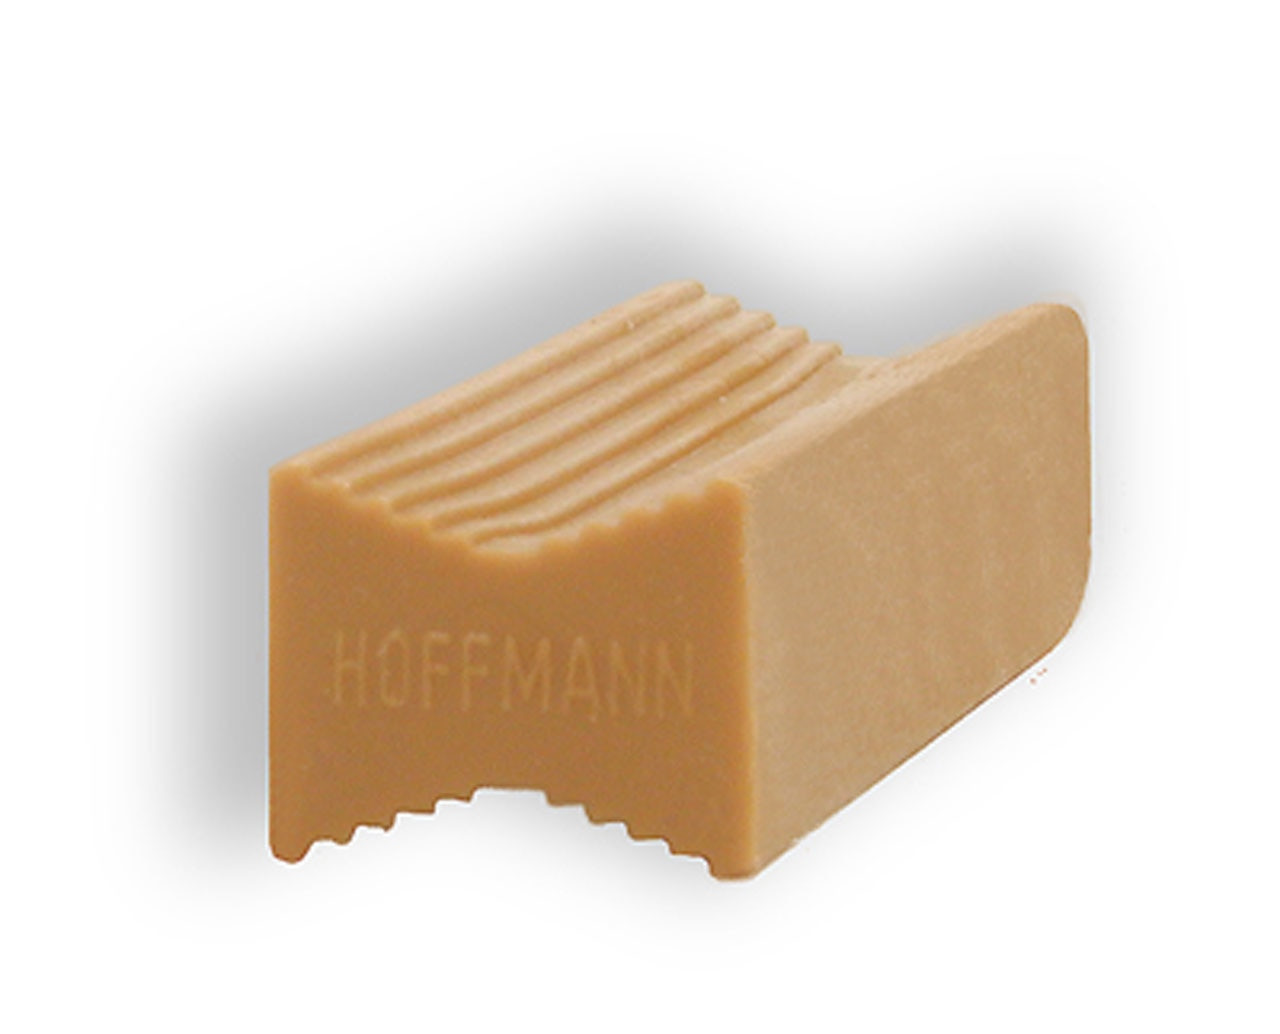 Hoffmann W-2 Dovetail Key, brown plastic